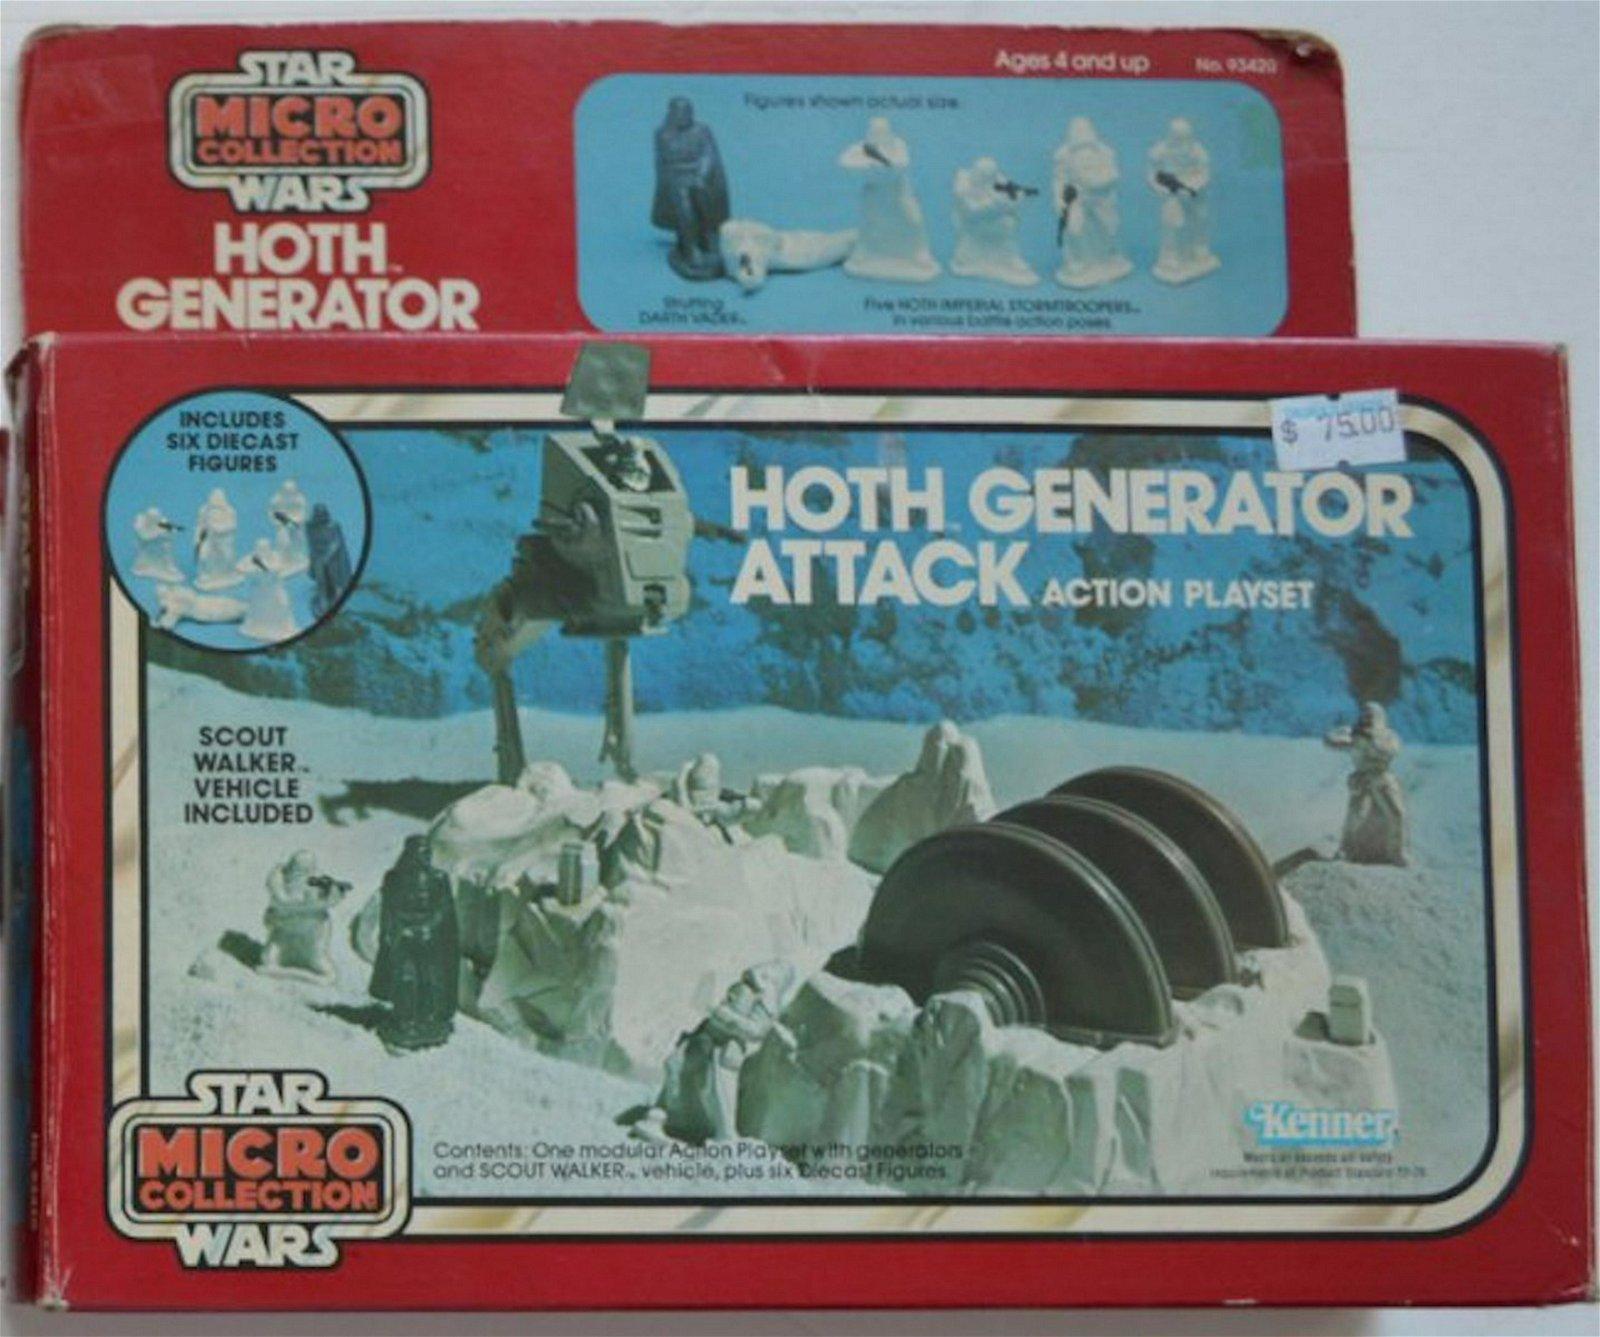 STAR WARS HOTH GENERATOR ATTACK ACTION SET. NO 93420